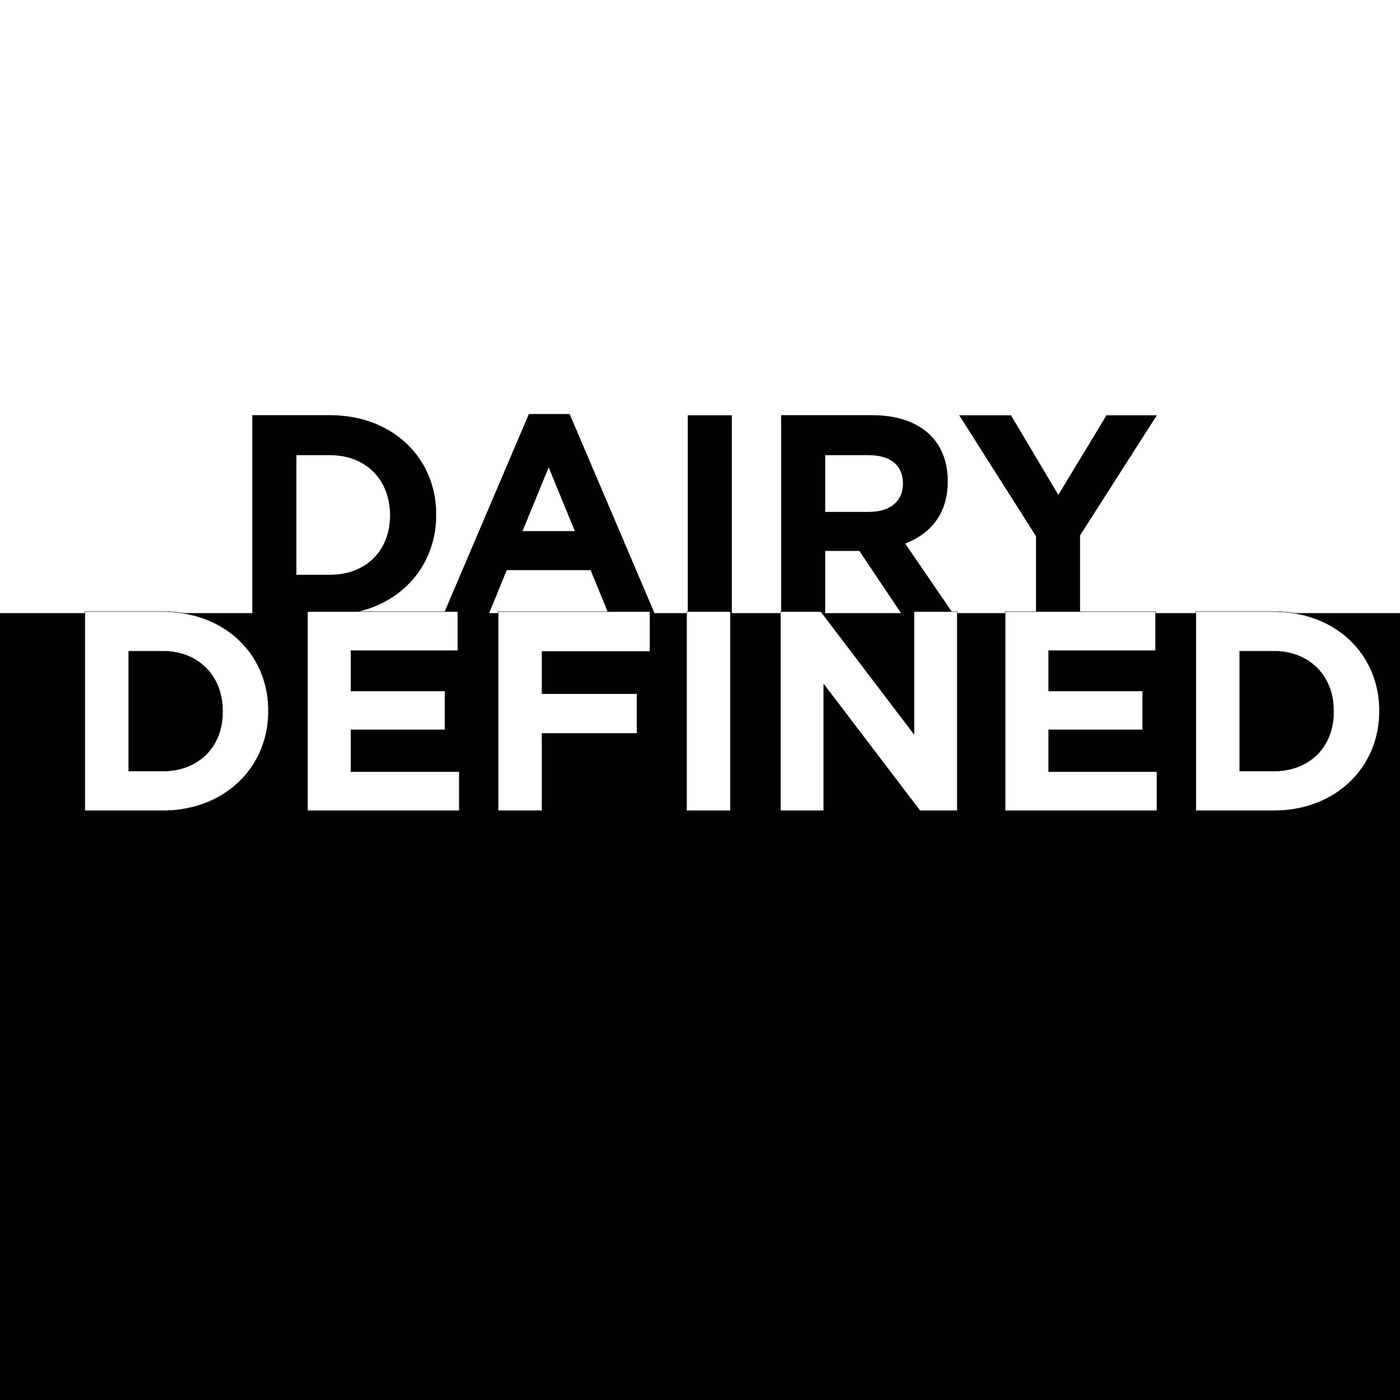 Milk Prices Remain a Roller Coaster Amid COVID-19, NMPF's Vitaliano Says